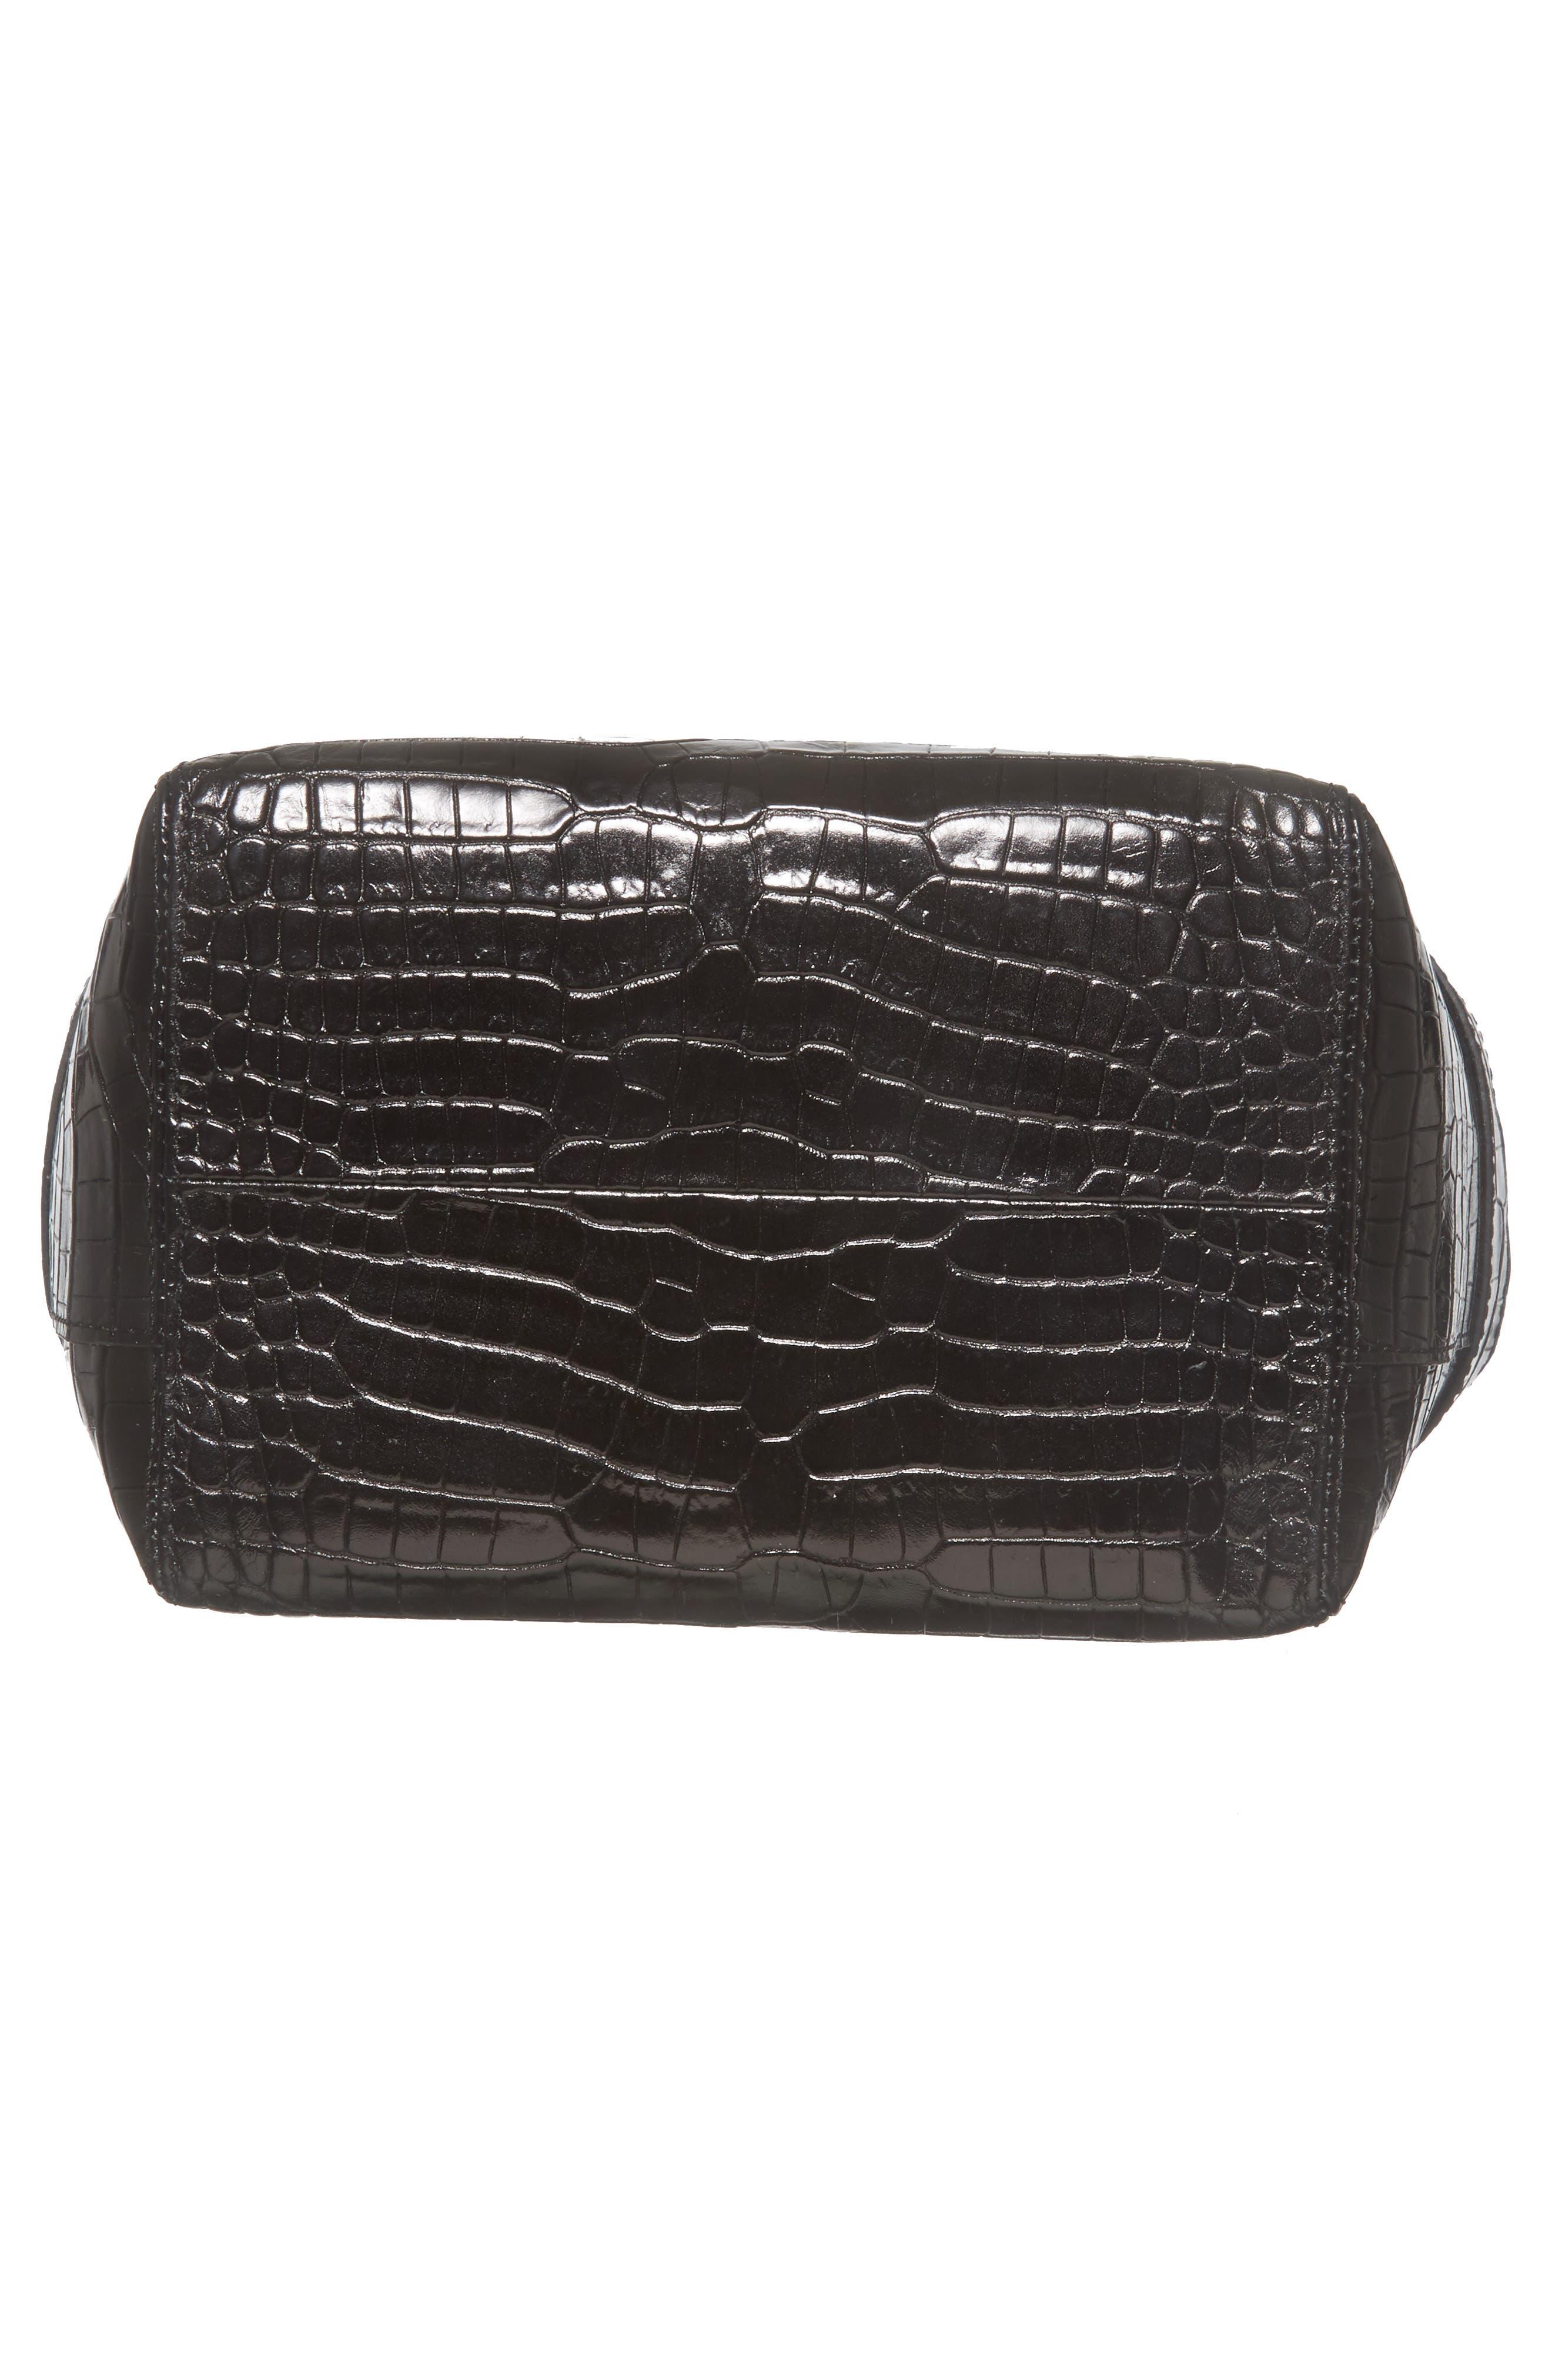 Keely Leather Crossbody Bag,                             Alternate thumbnail 6, color,                             Black